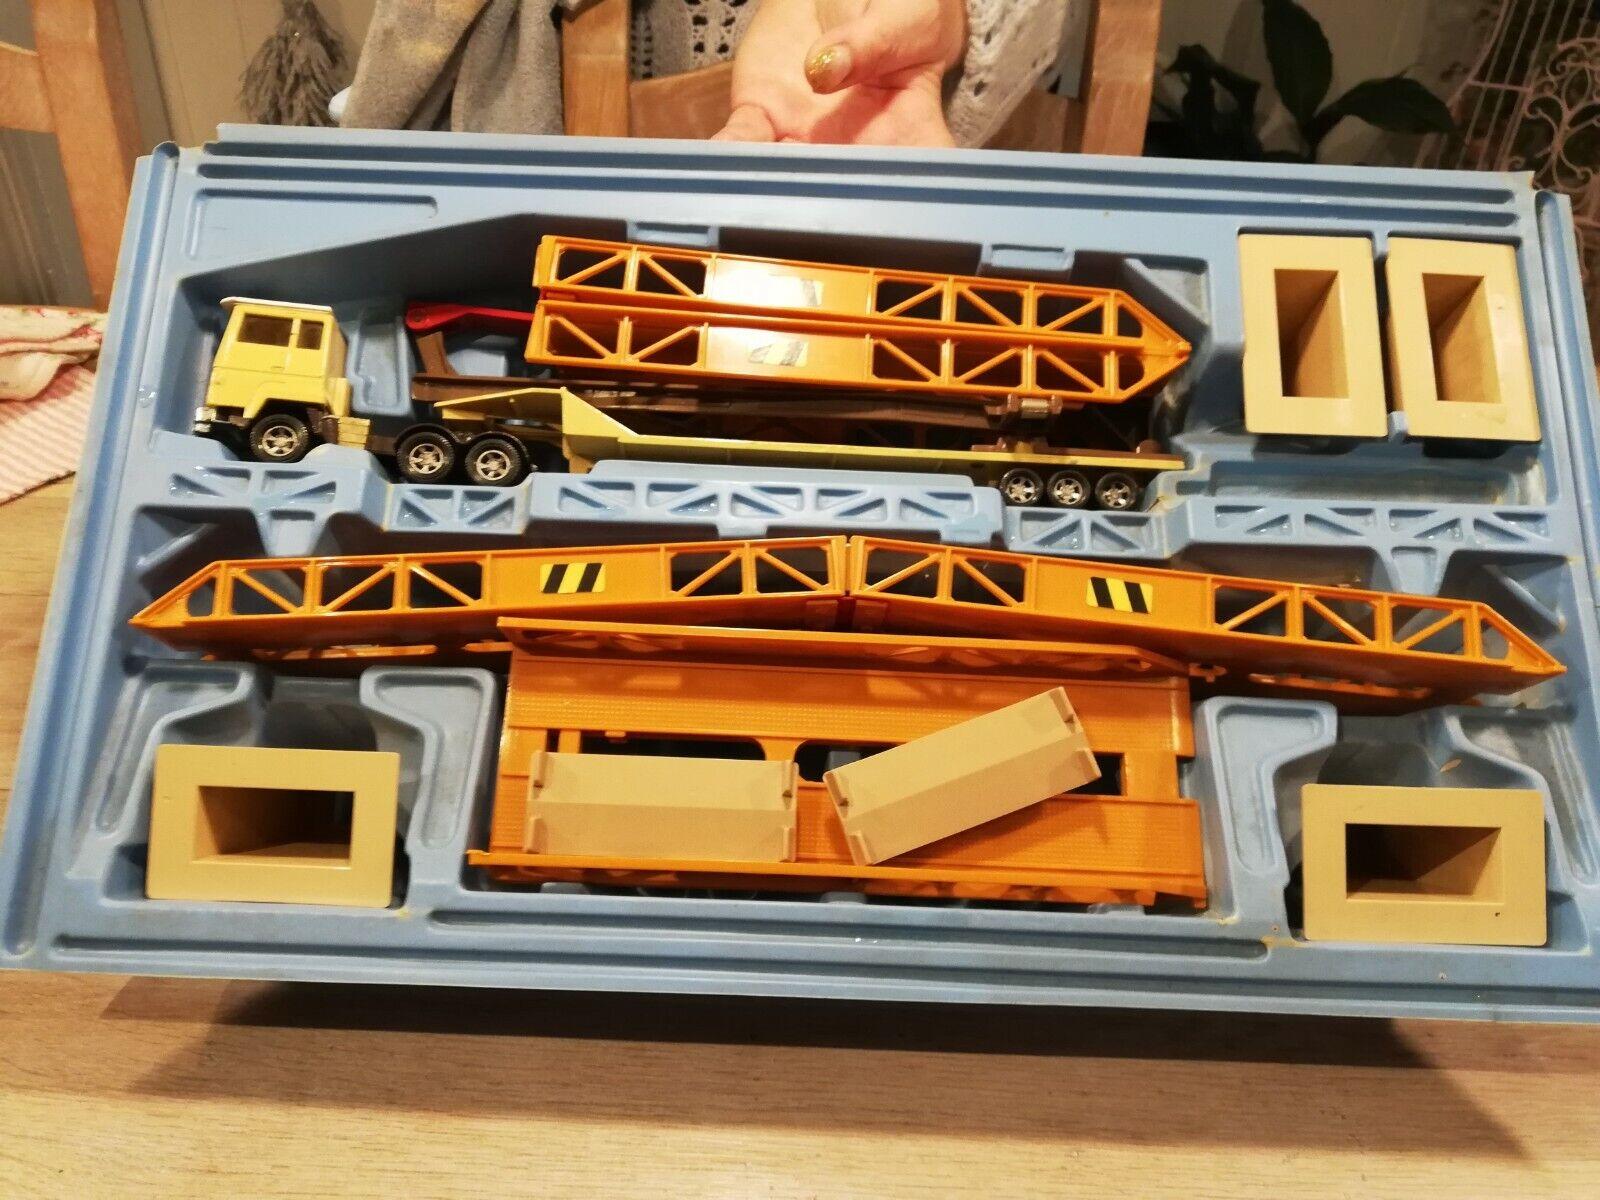 Matchbox superkings sk-44 3 bridge transporter